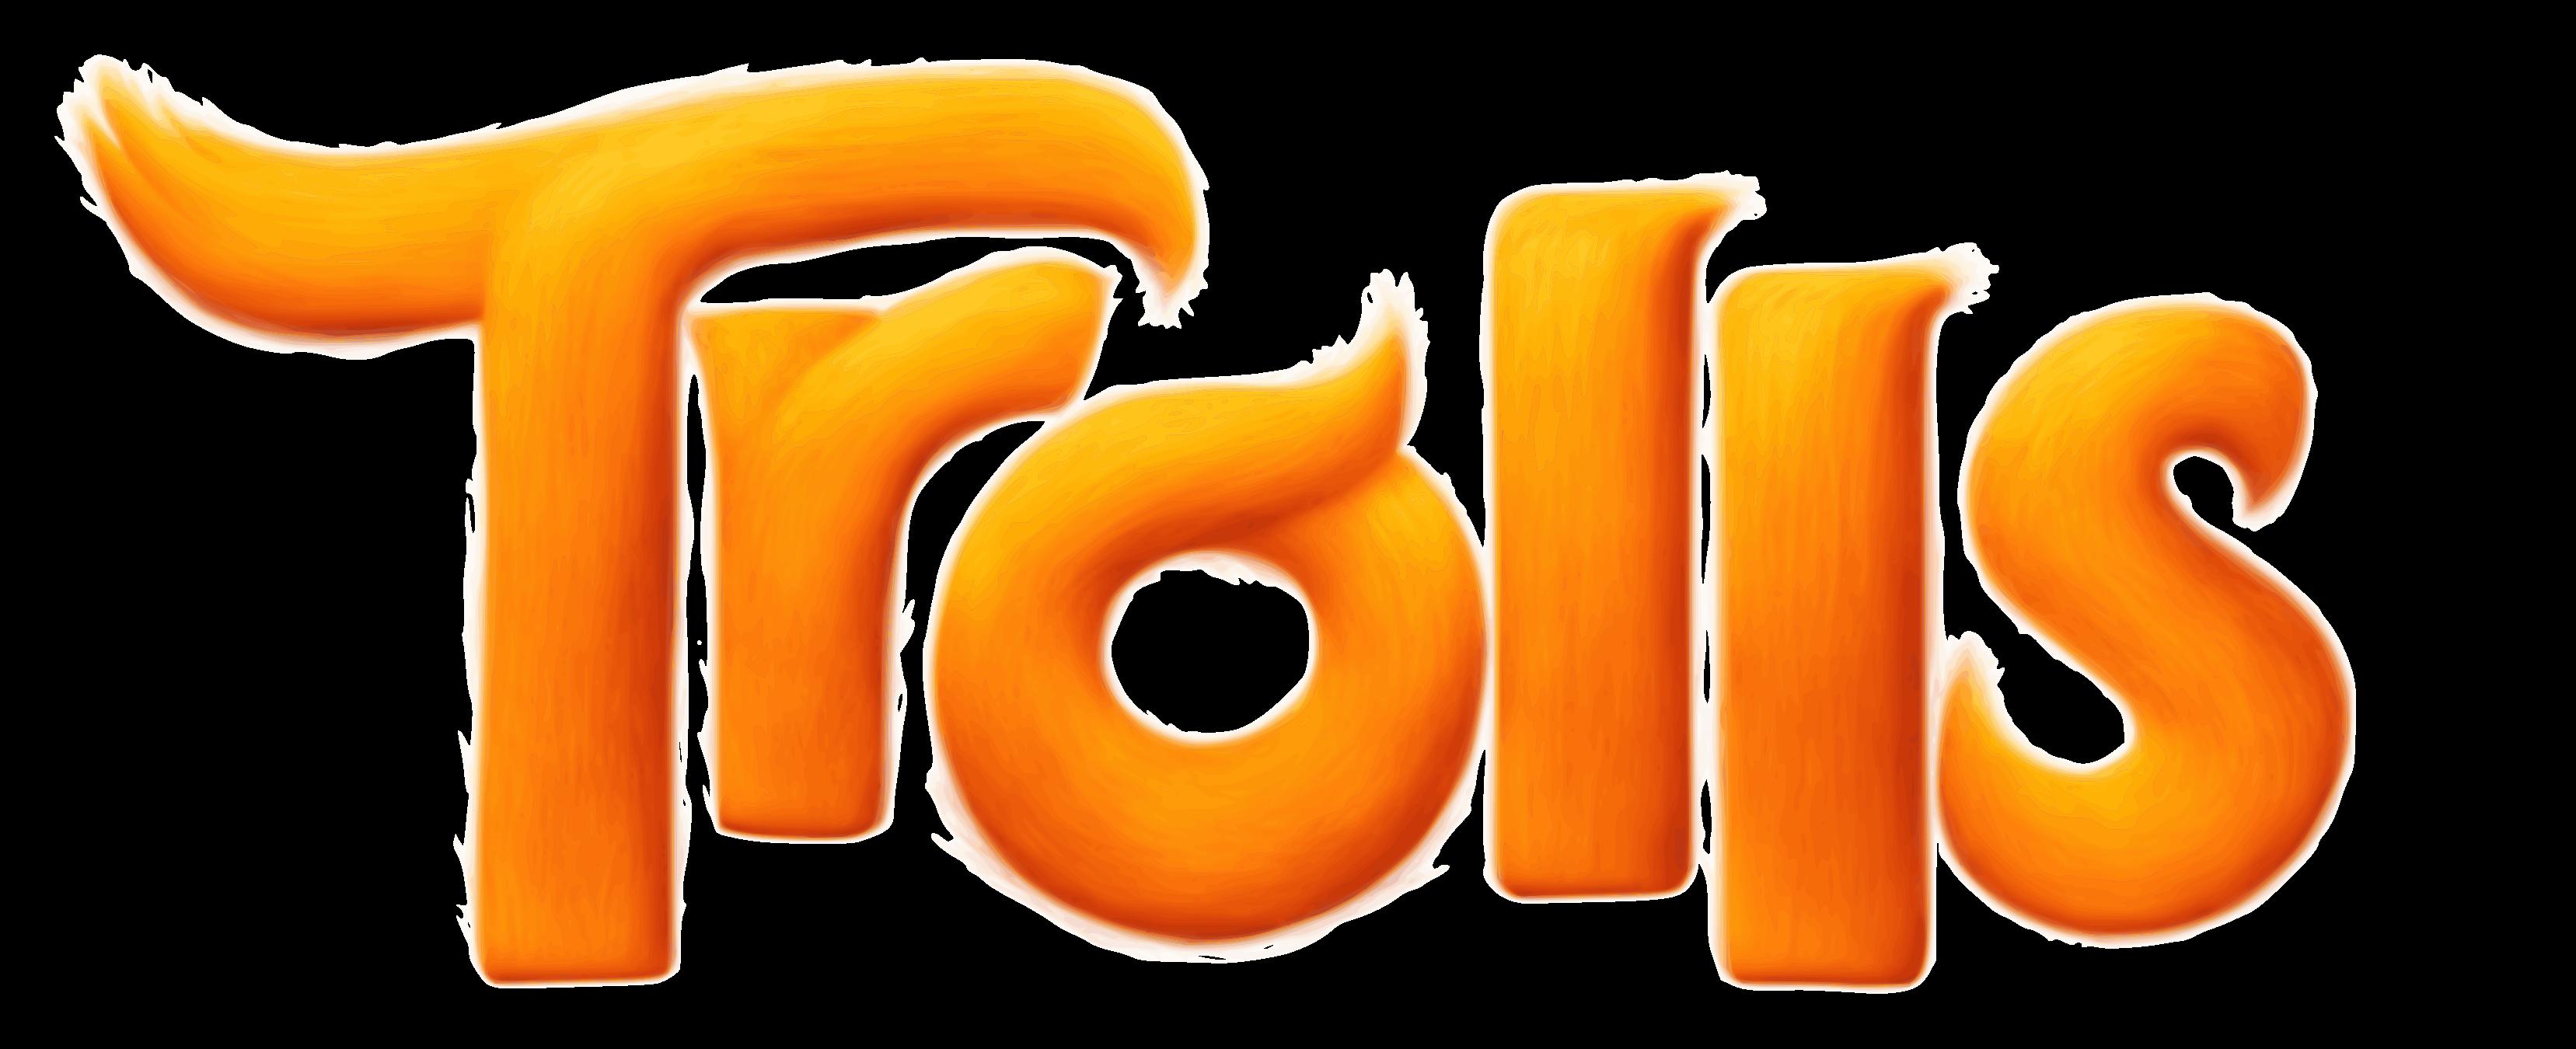 Trolls_-_Alternative_Logo